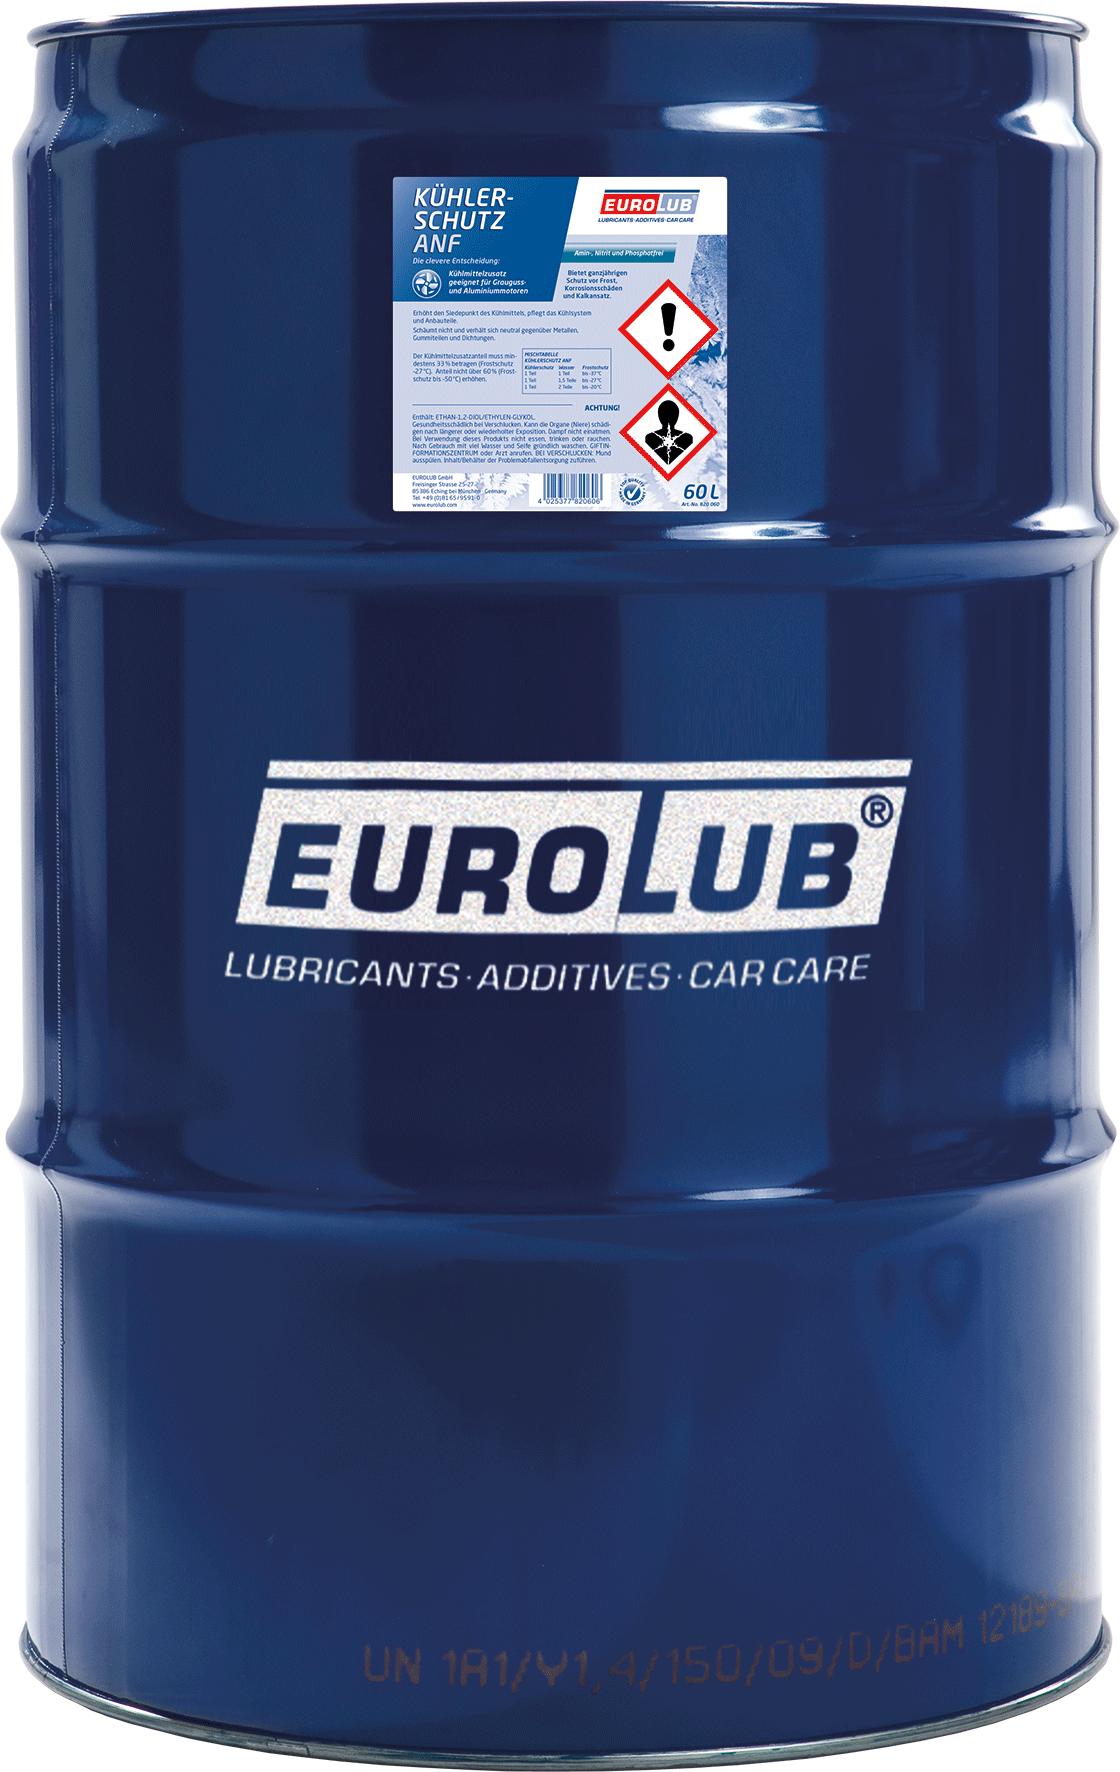 EUROLUB Kuhlerschutz ANF